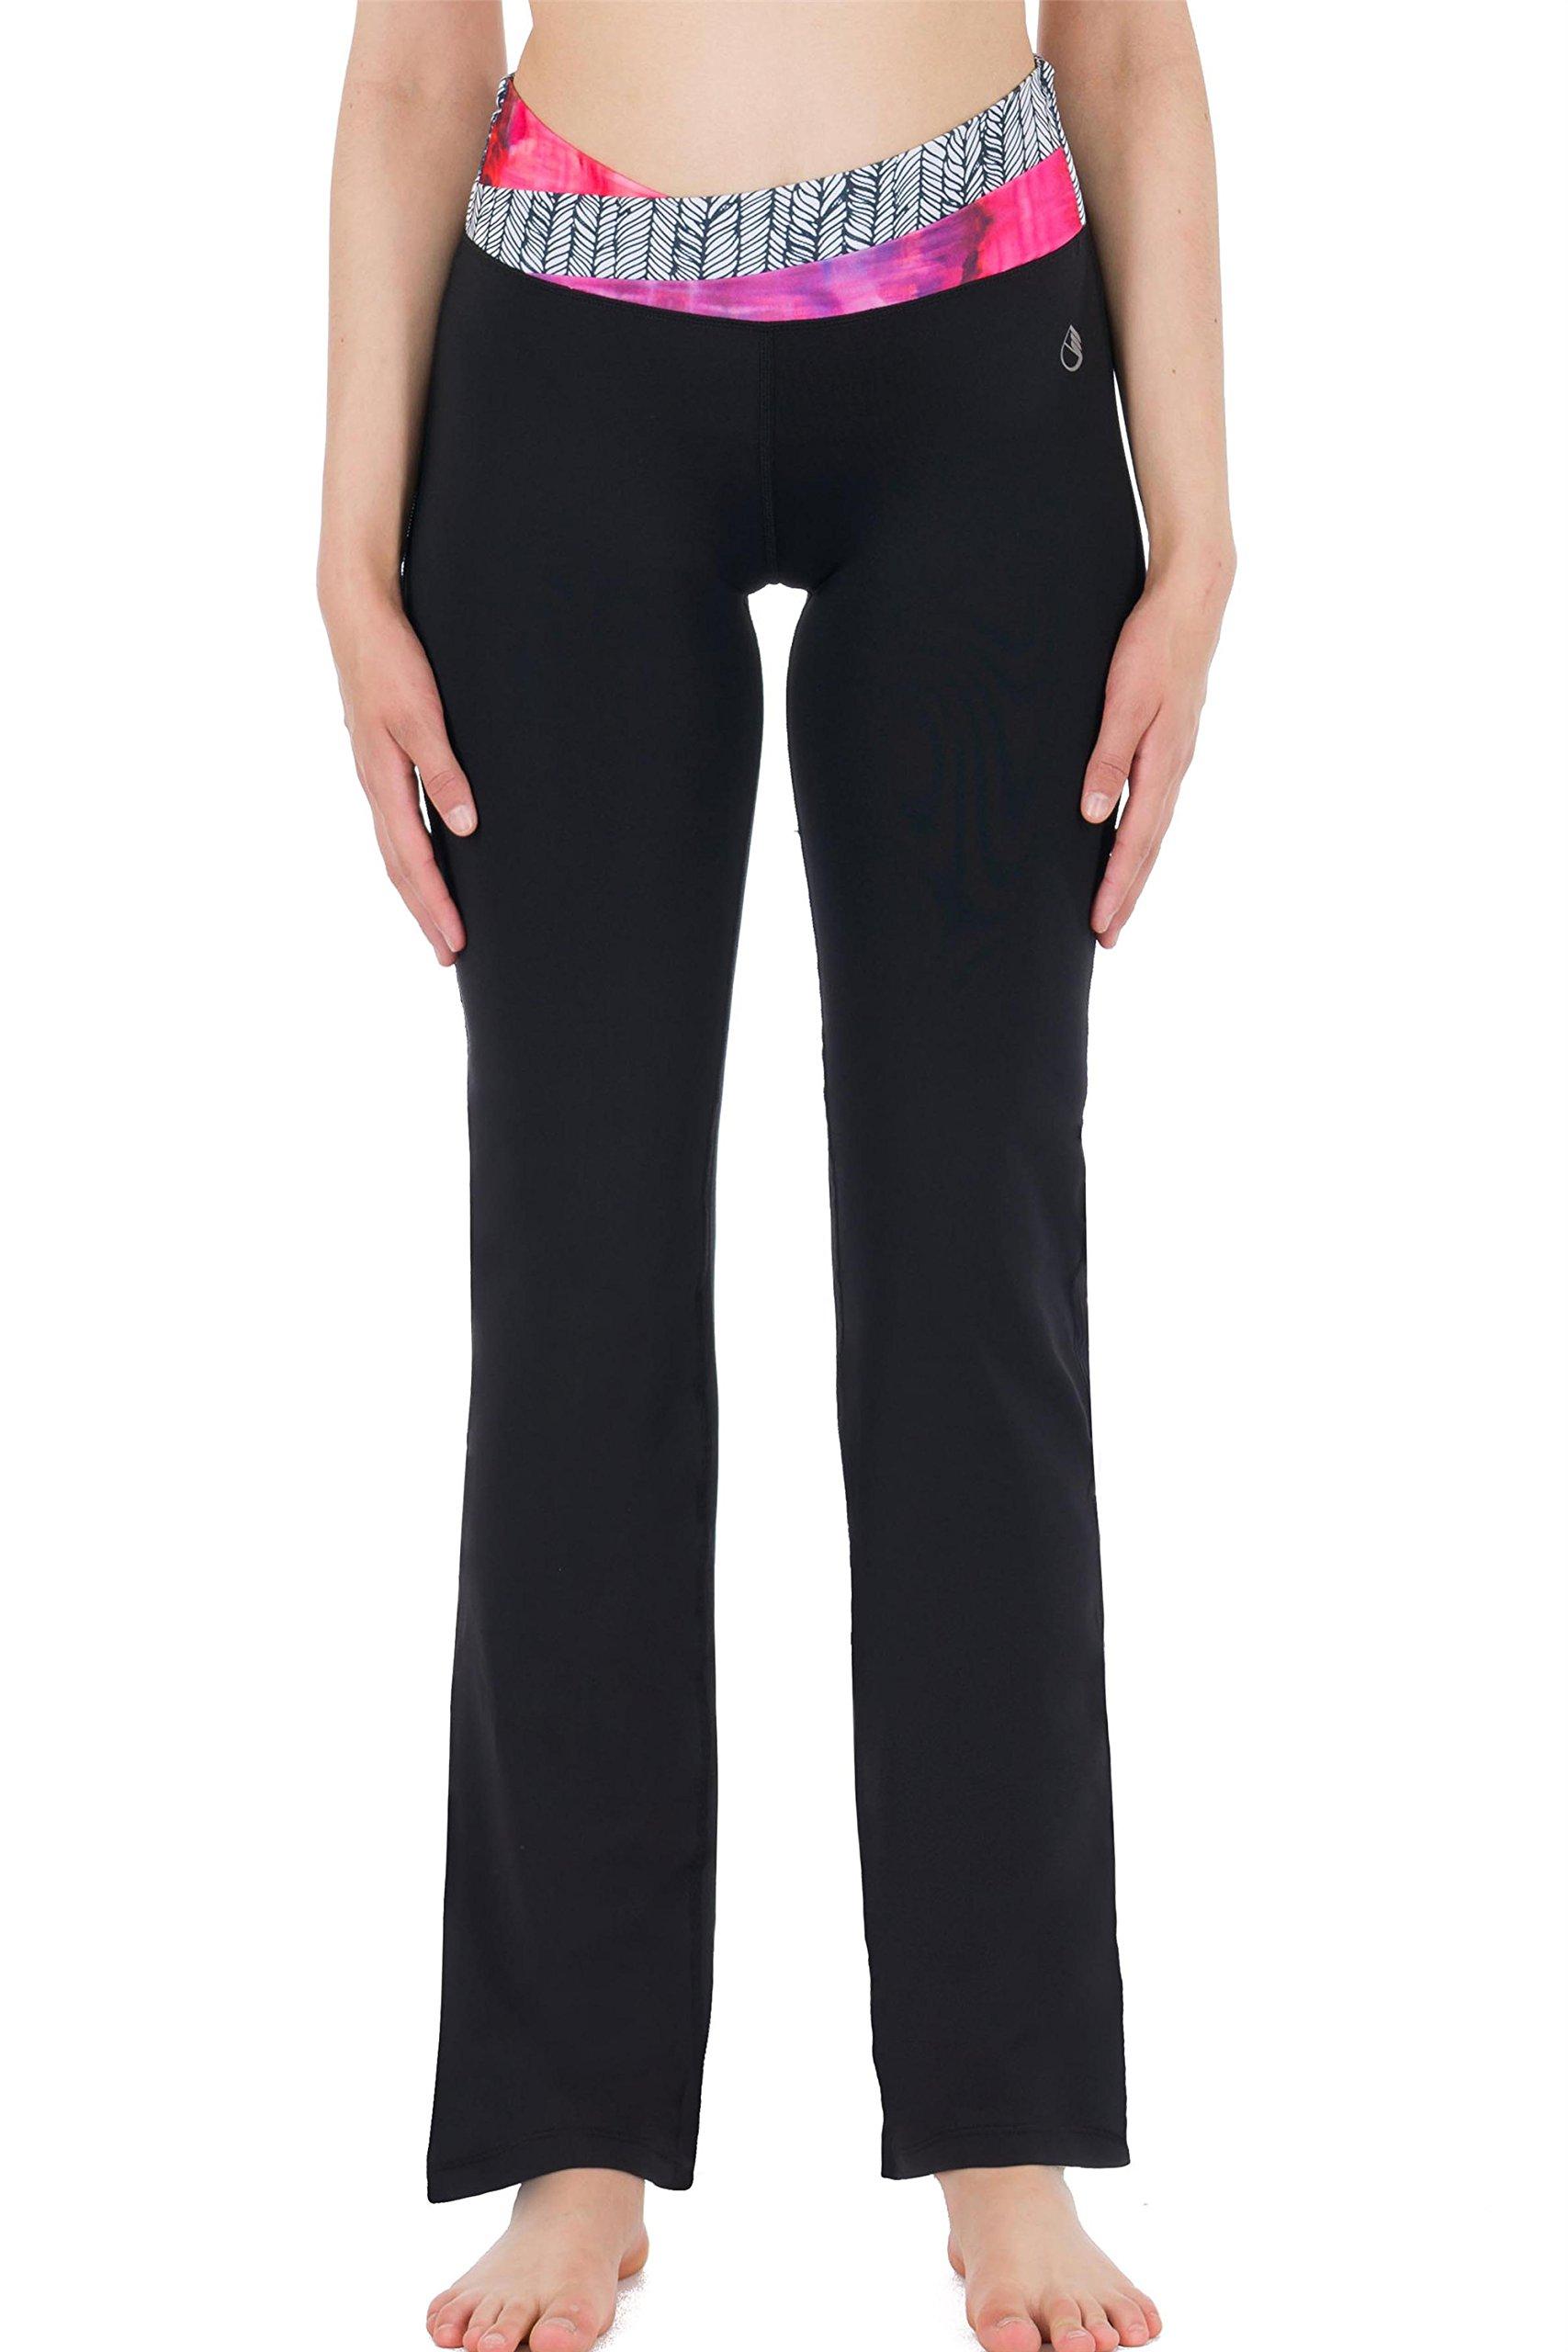 icyzone Women\'s Workout Contrast Waist Yoga Bootcut Bootleg Pants (XL, Leaves&Impression)